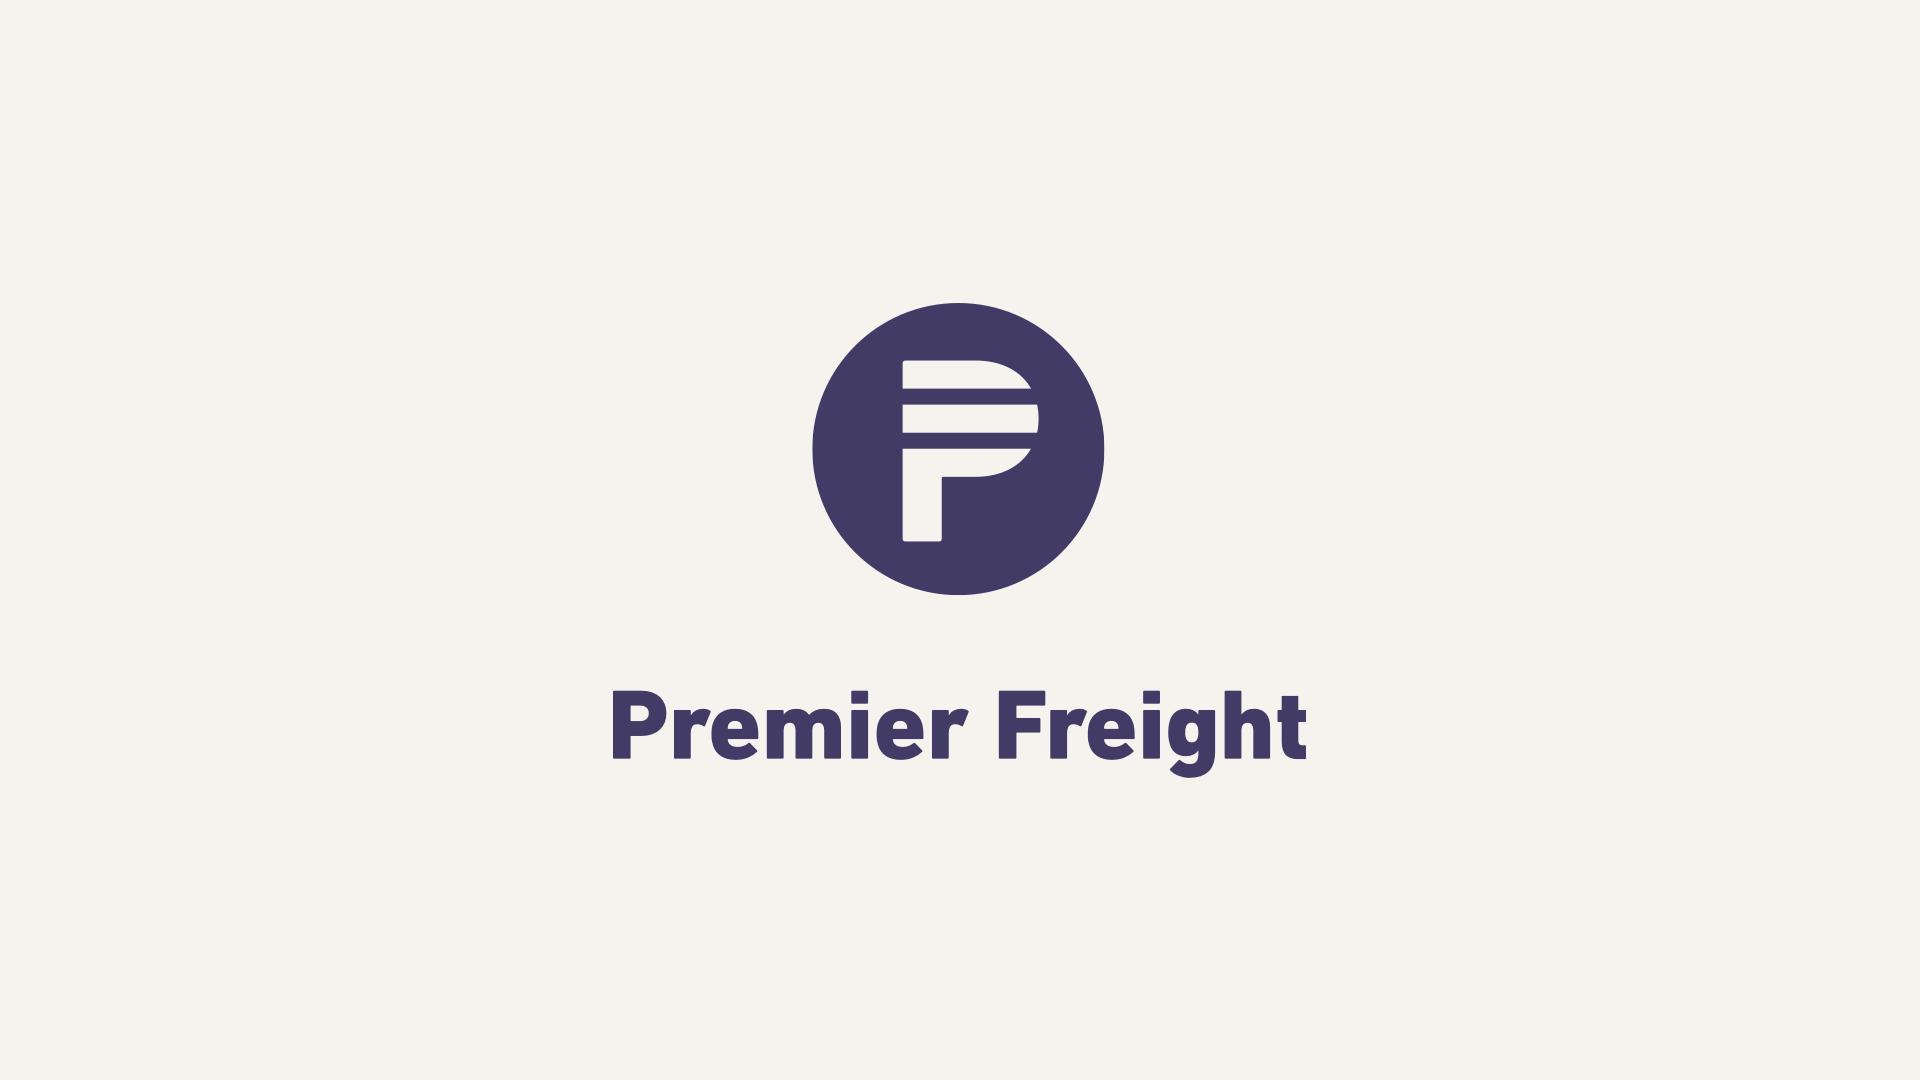 Premier Freight Logo: Vertical Lockup